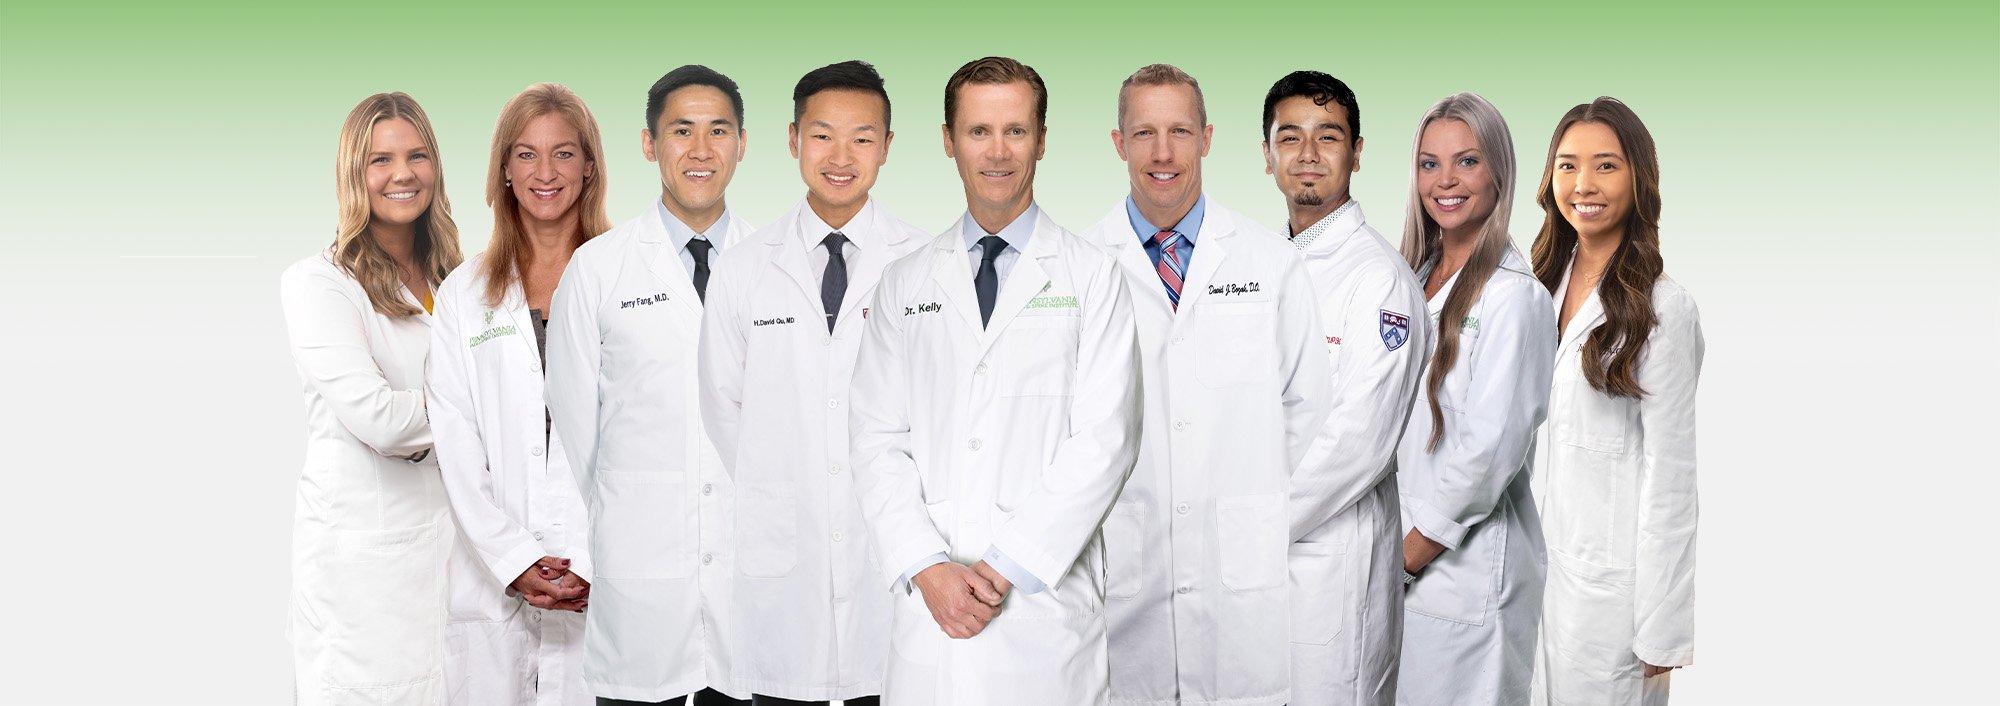 Penn Pain Staff